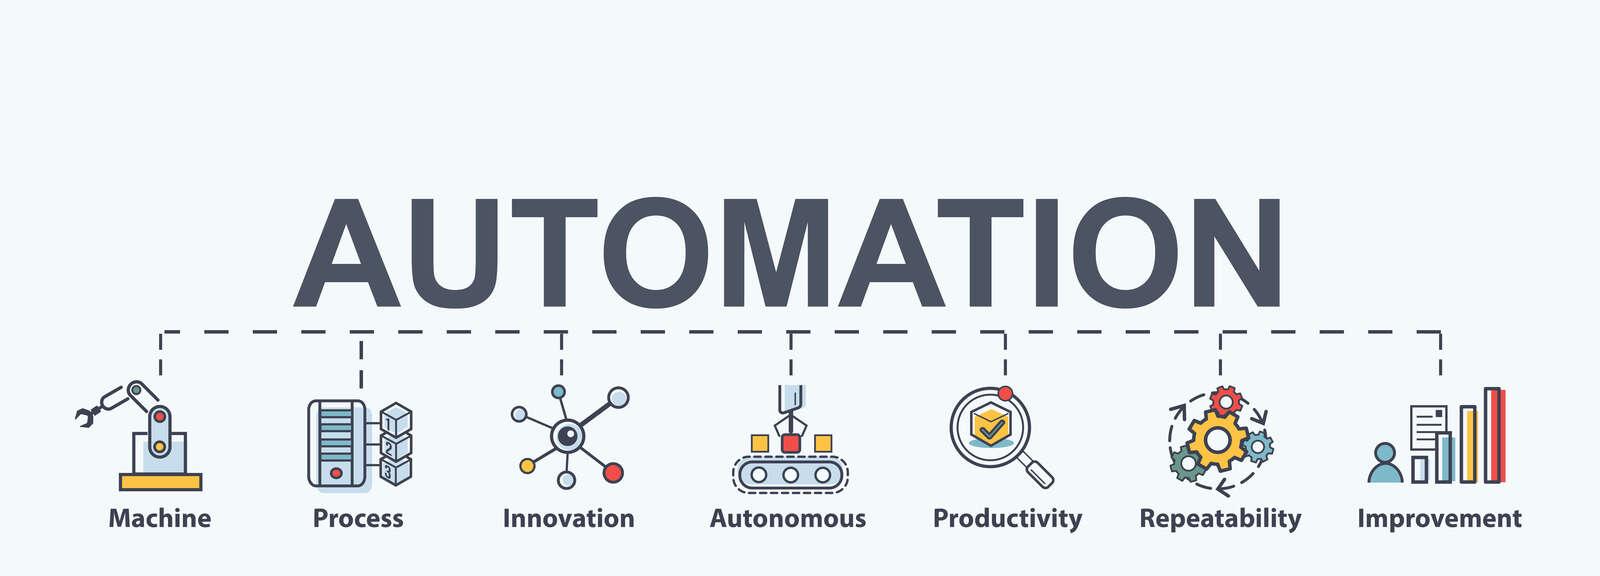 Benefits of Metadata-Driven Automation